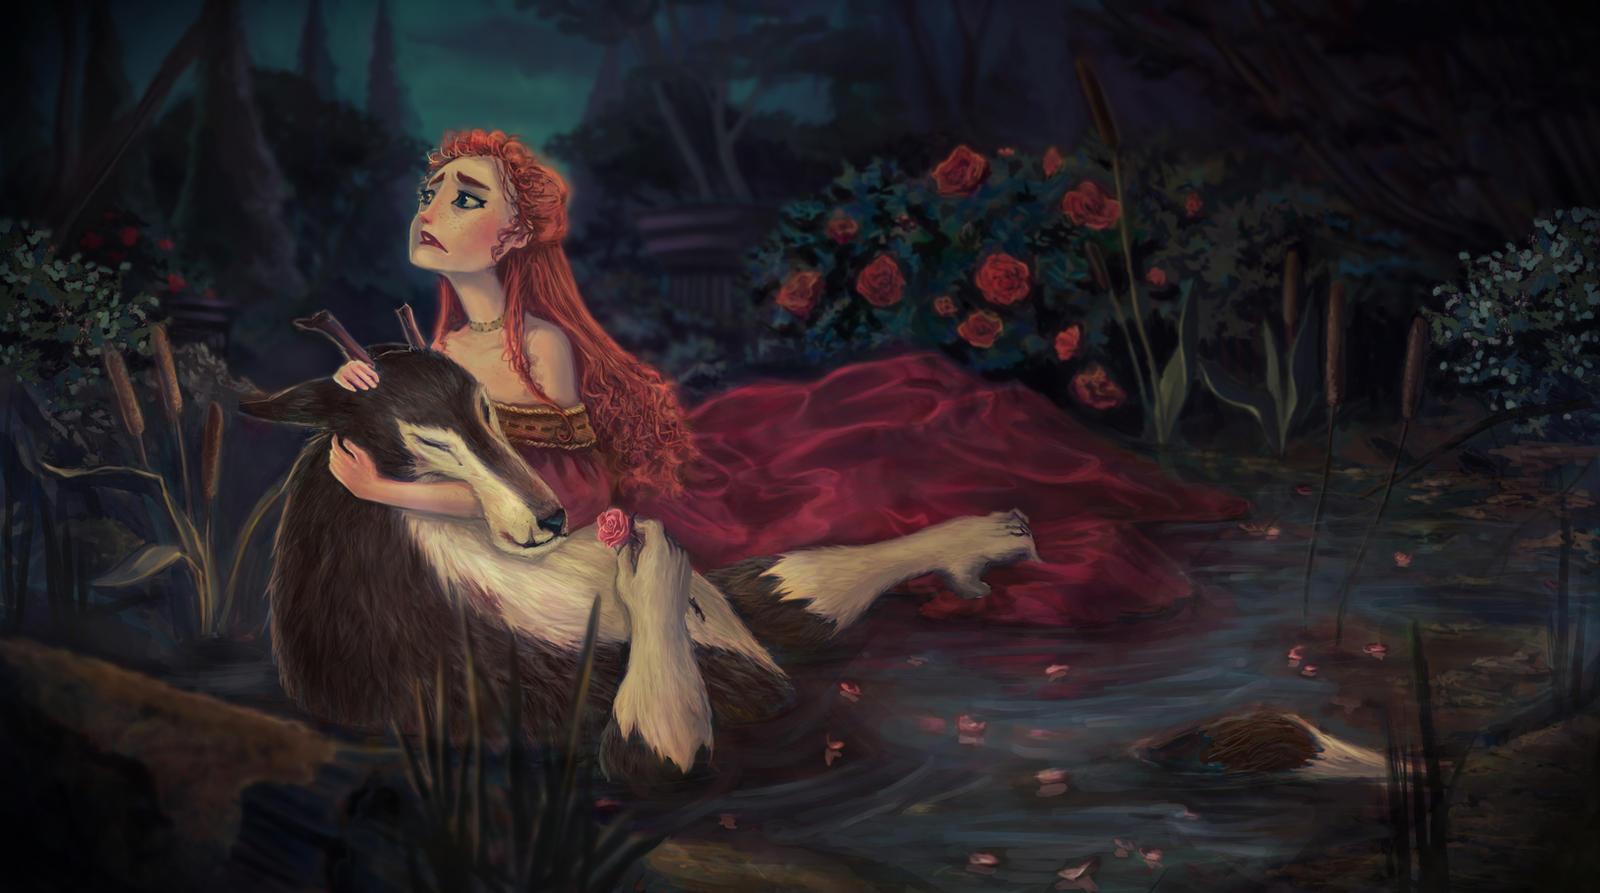 The Beast Dies by kelseymichele